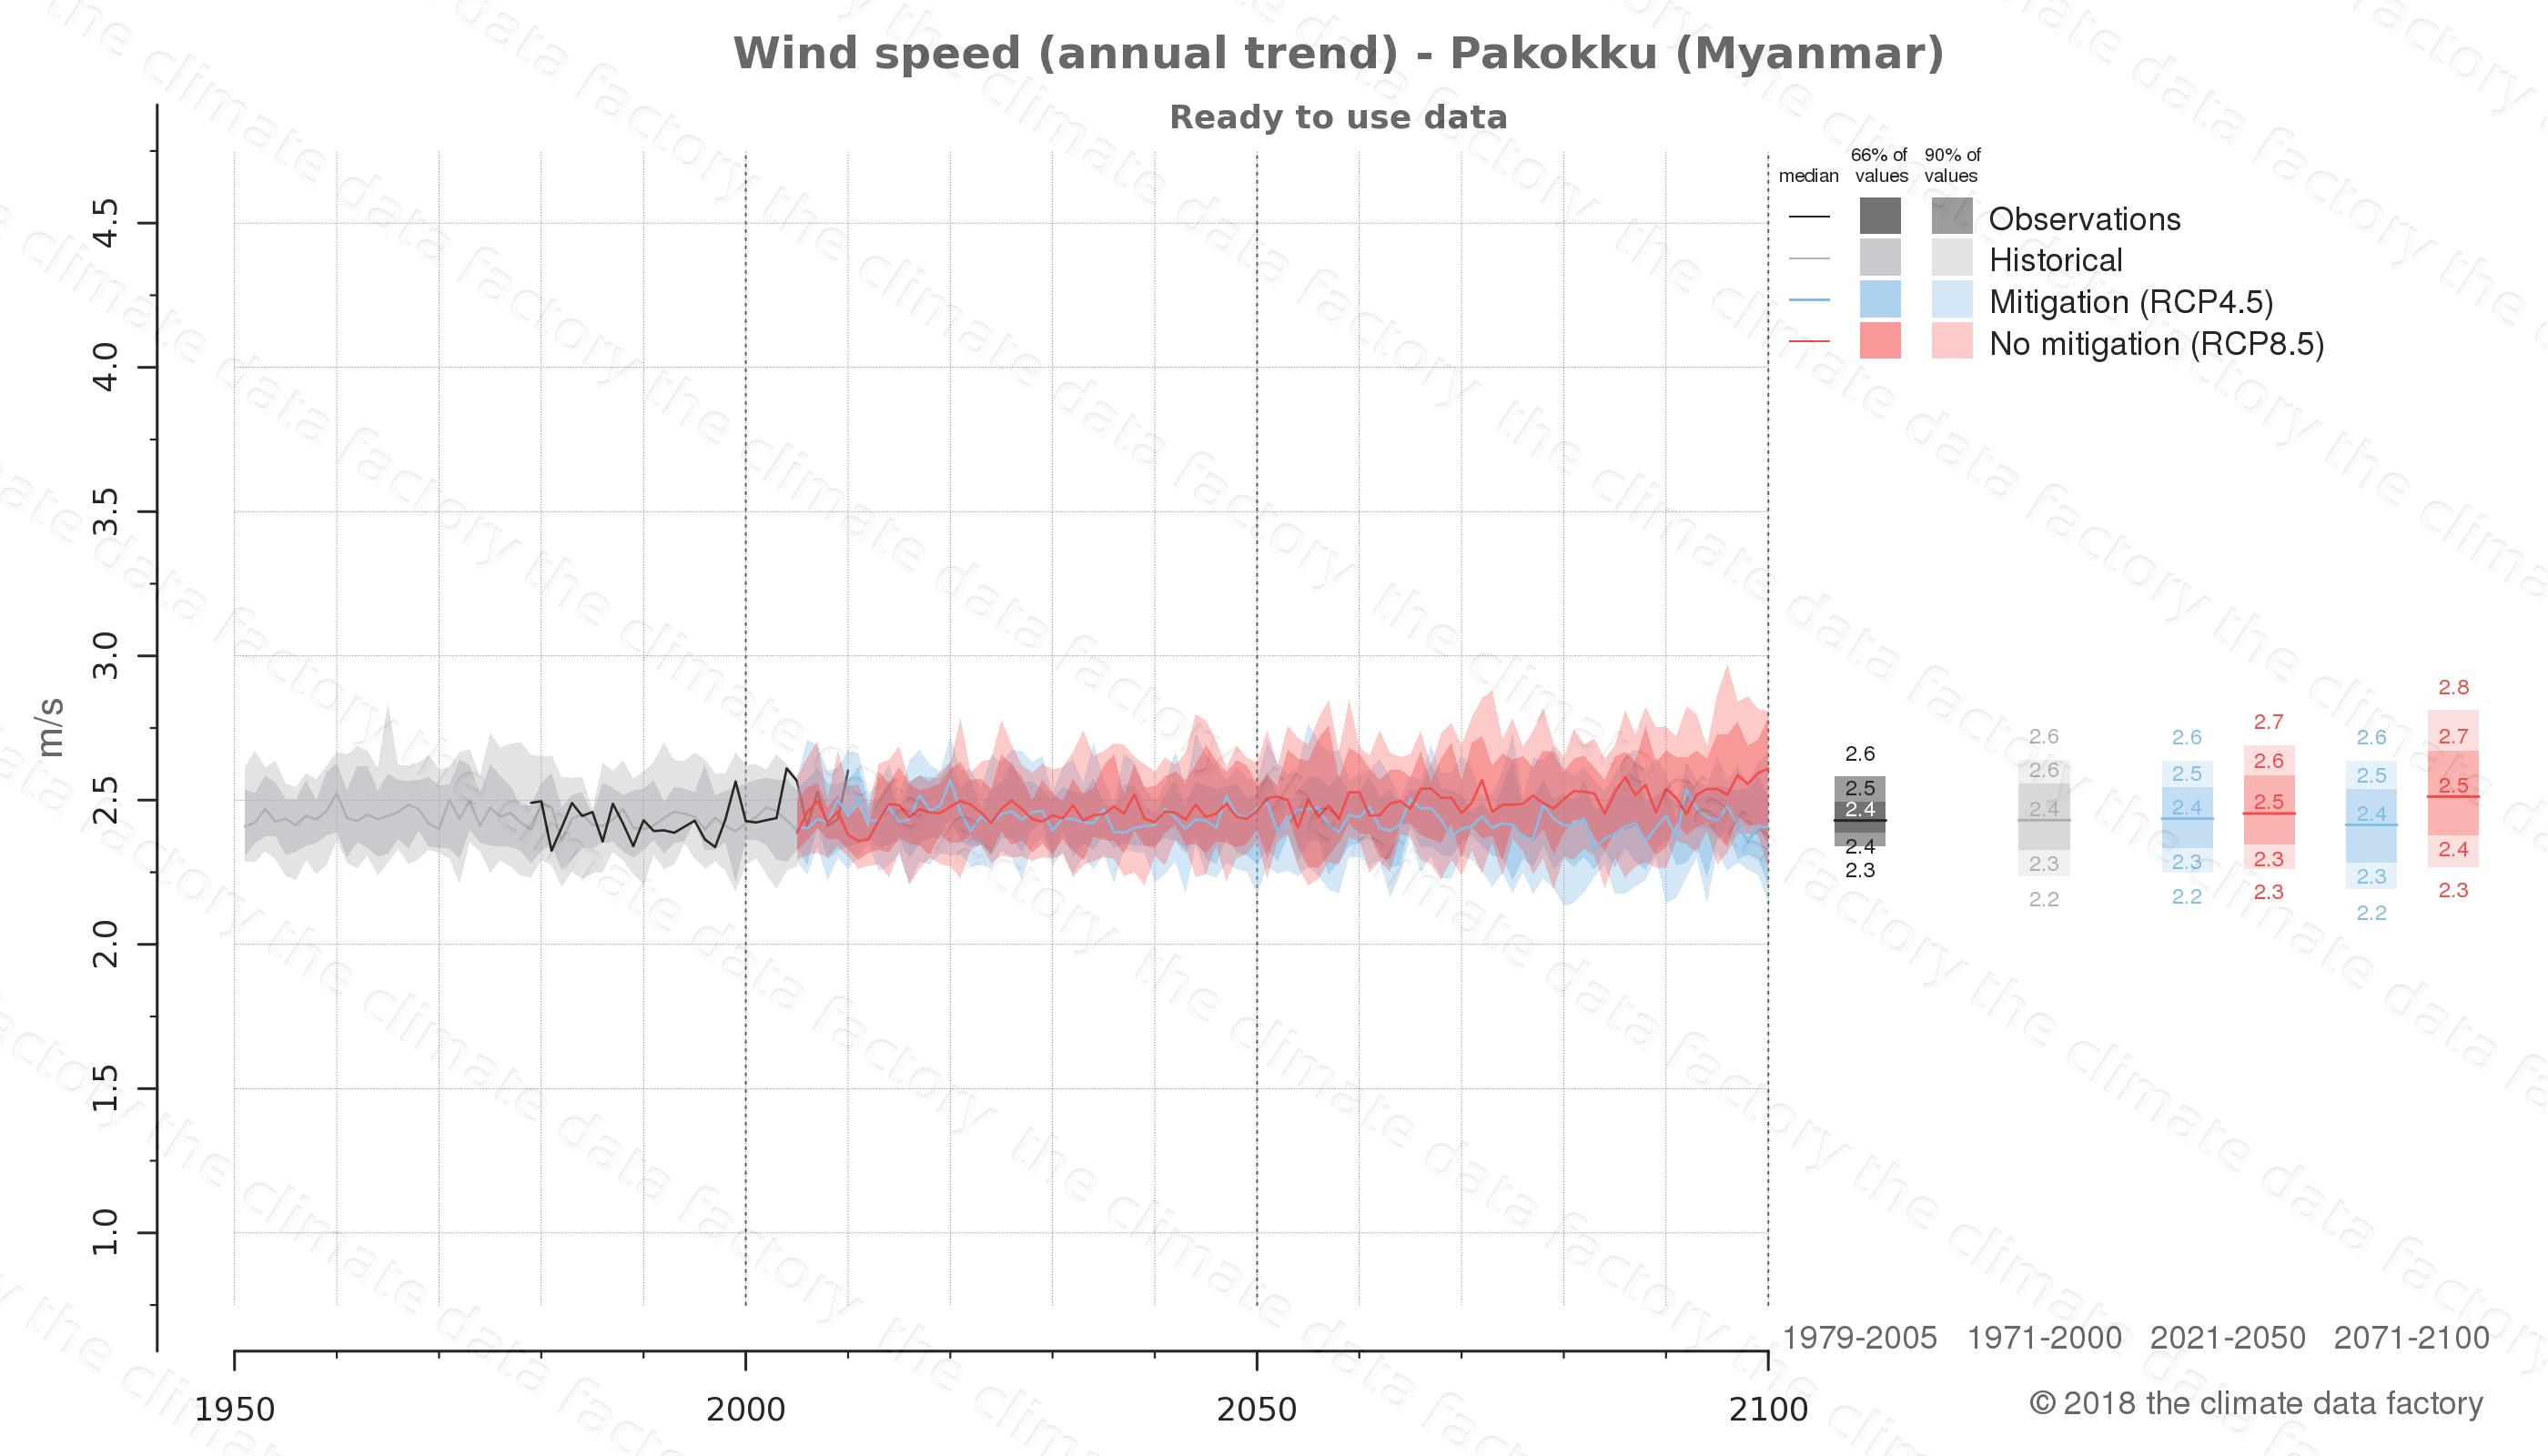 climate change data policy adaptation climate graph city data wind-speed pakokku myanmar